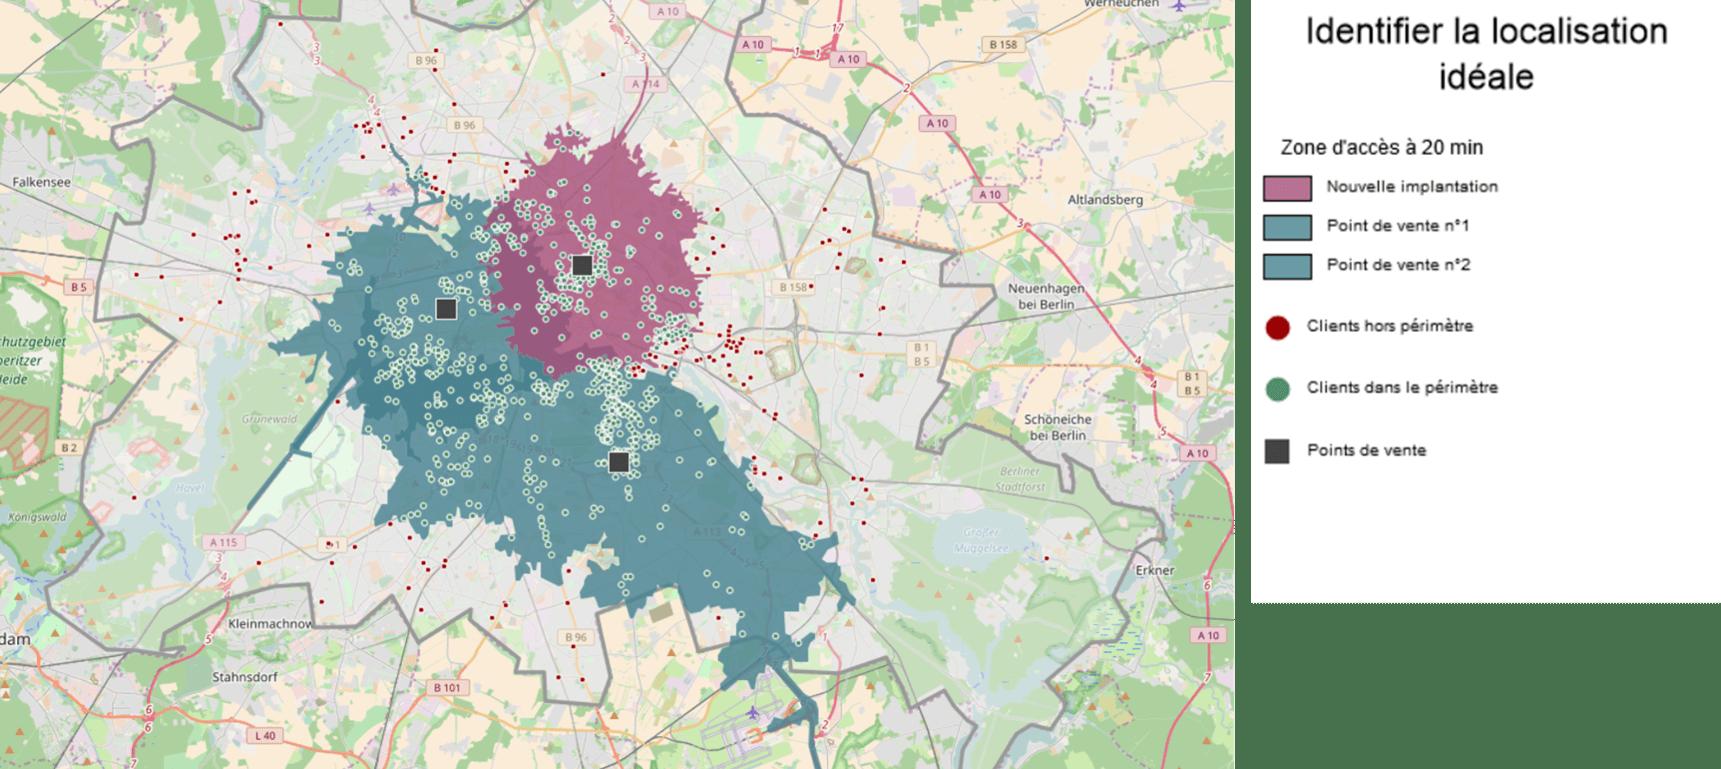 identification_localisation